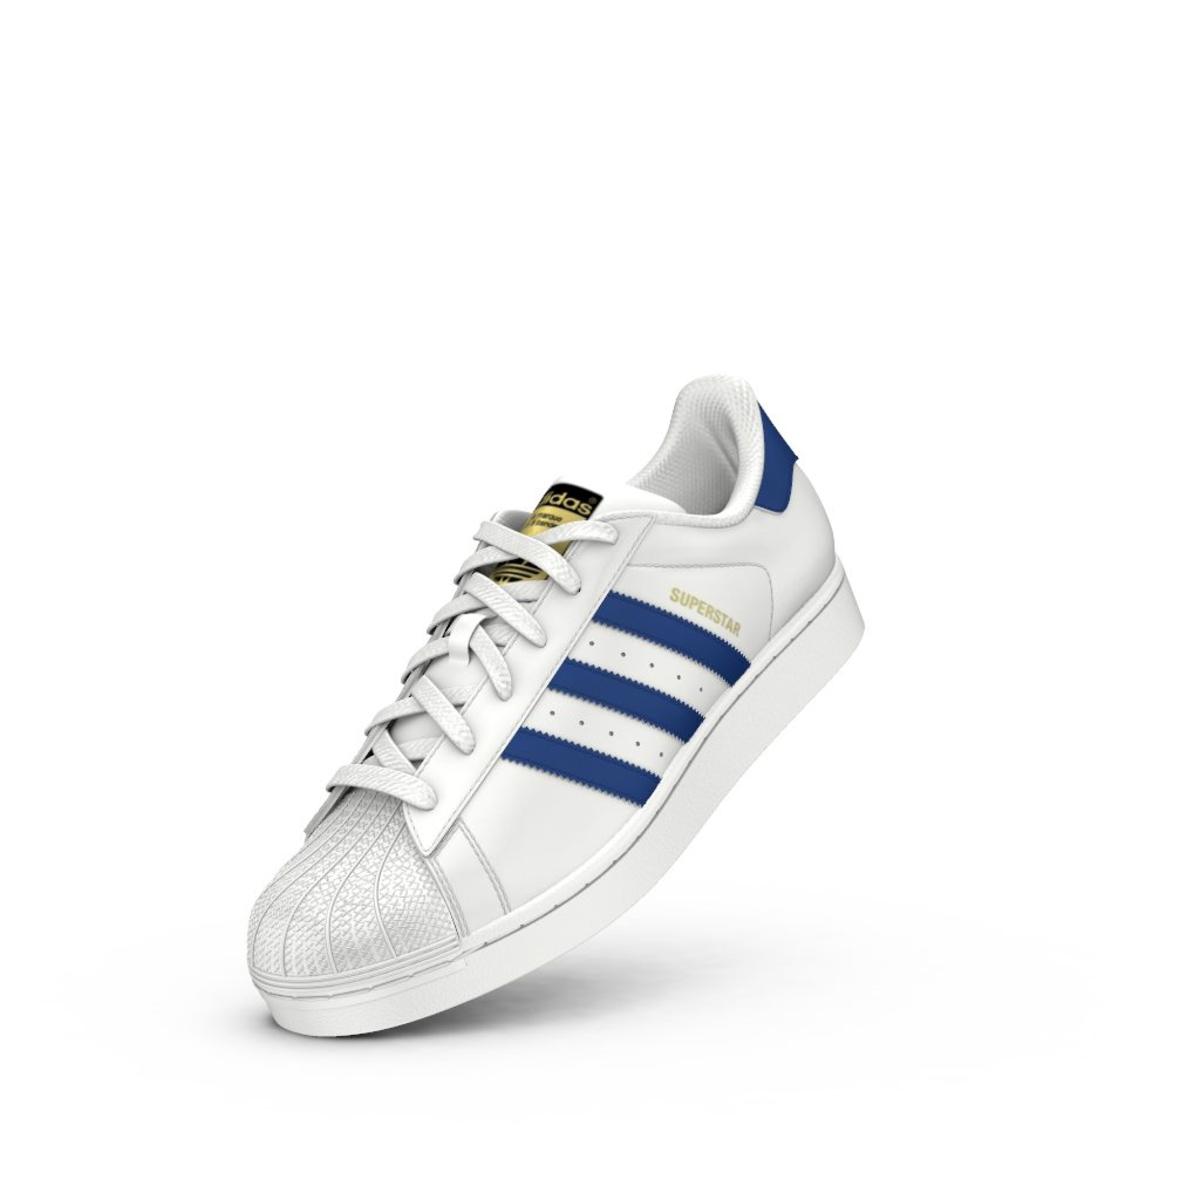 Adidas Superstar Adidas Originals Sneaker Schuh Adidas png